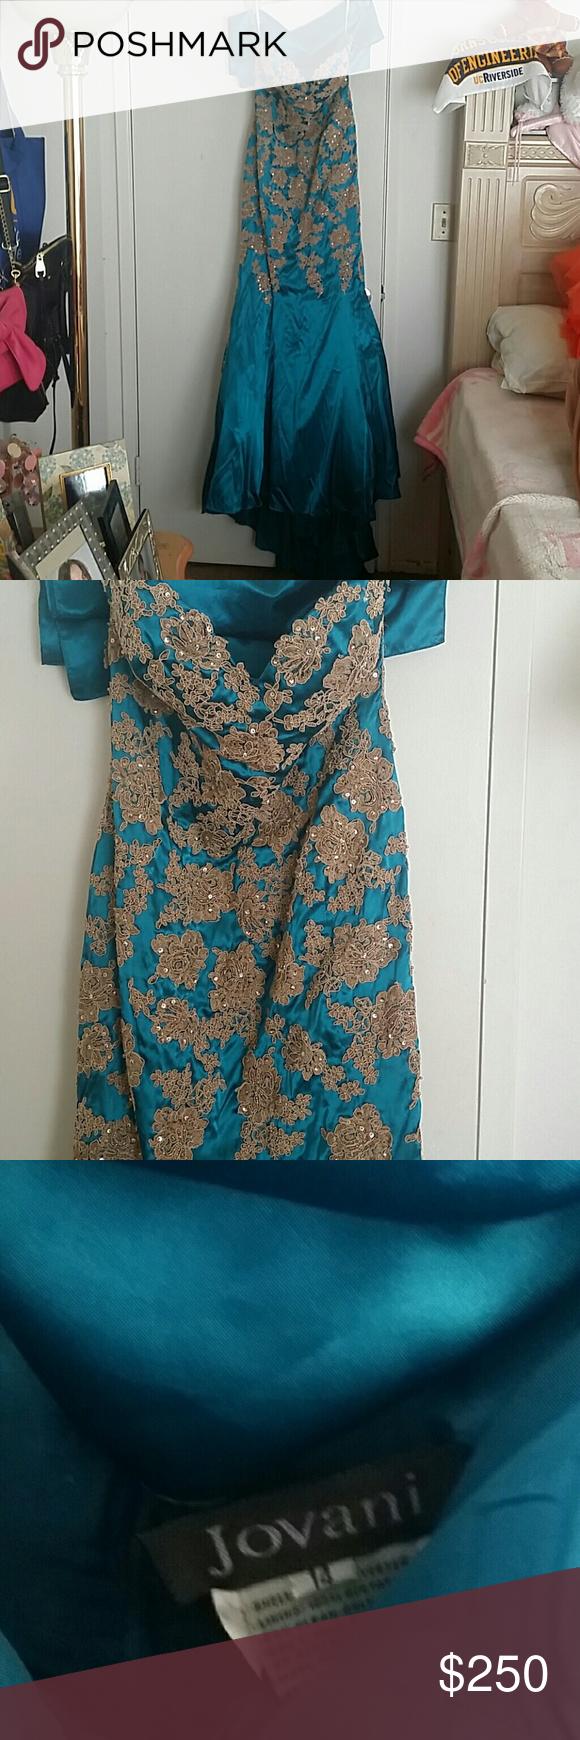 Turquise and beige satin jovani mermaid dress